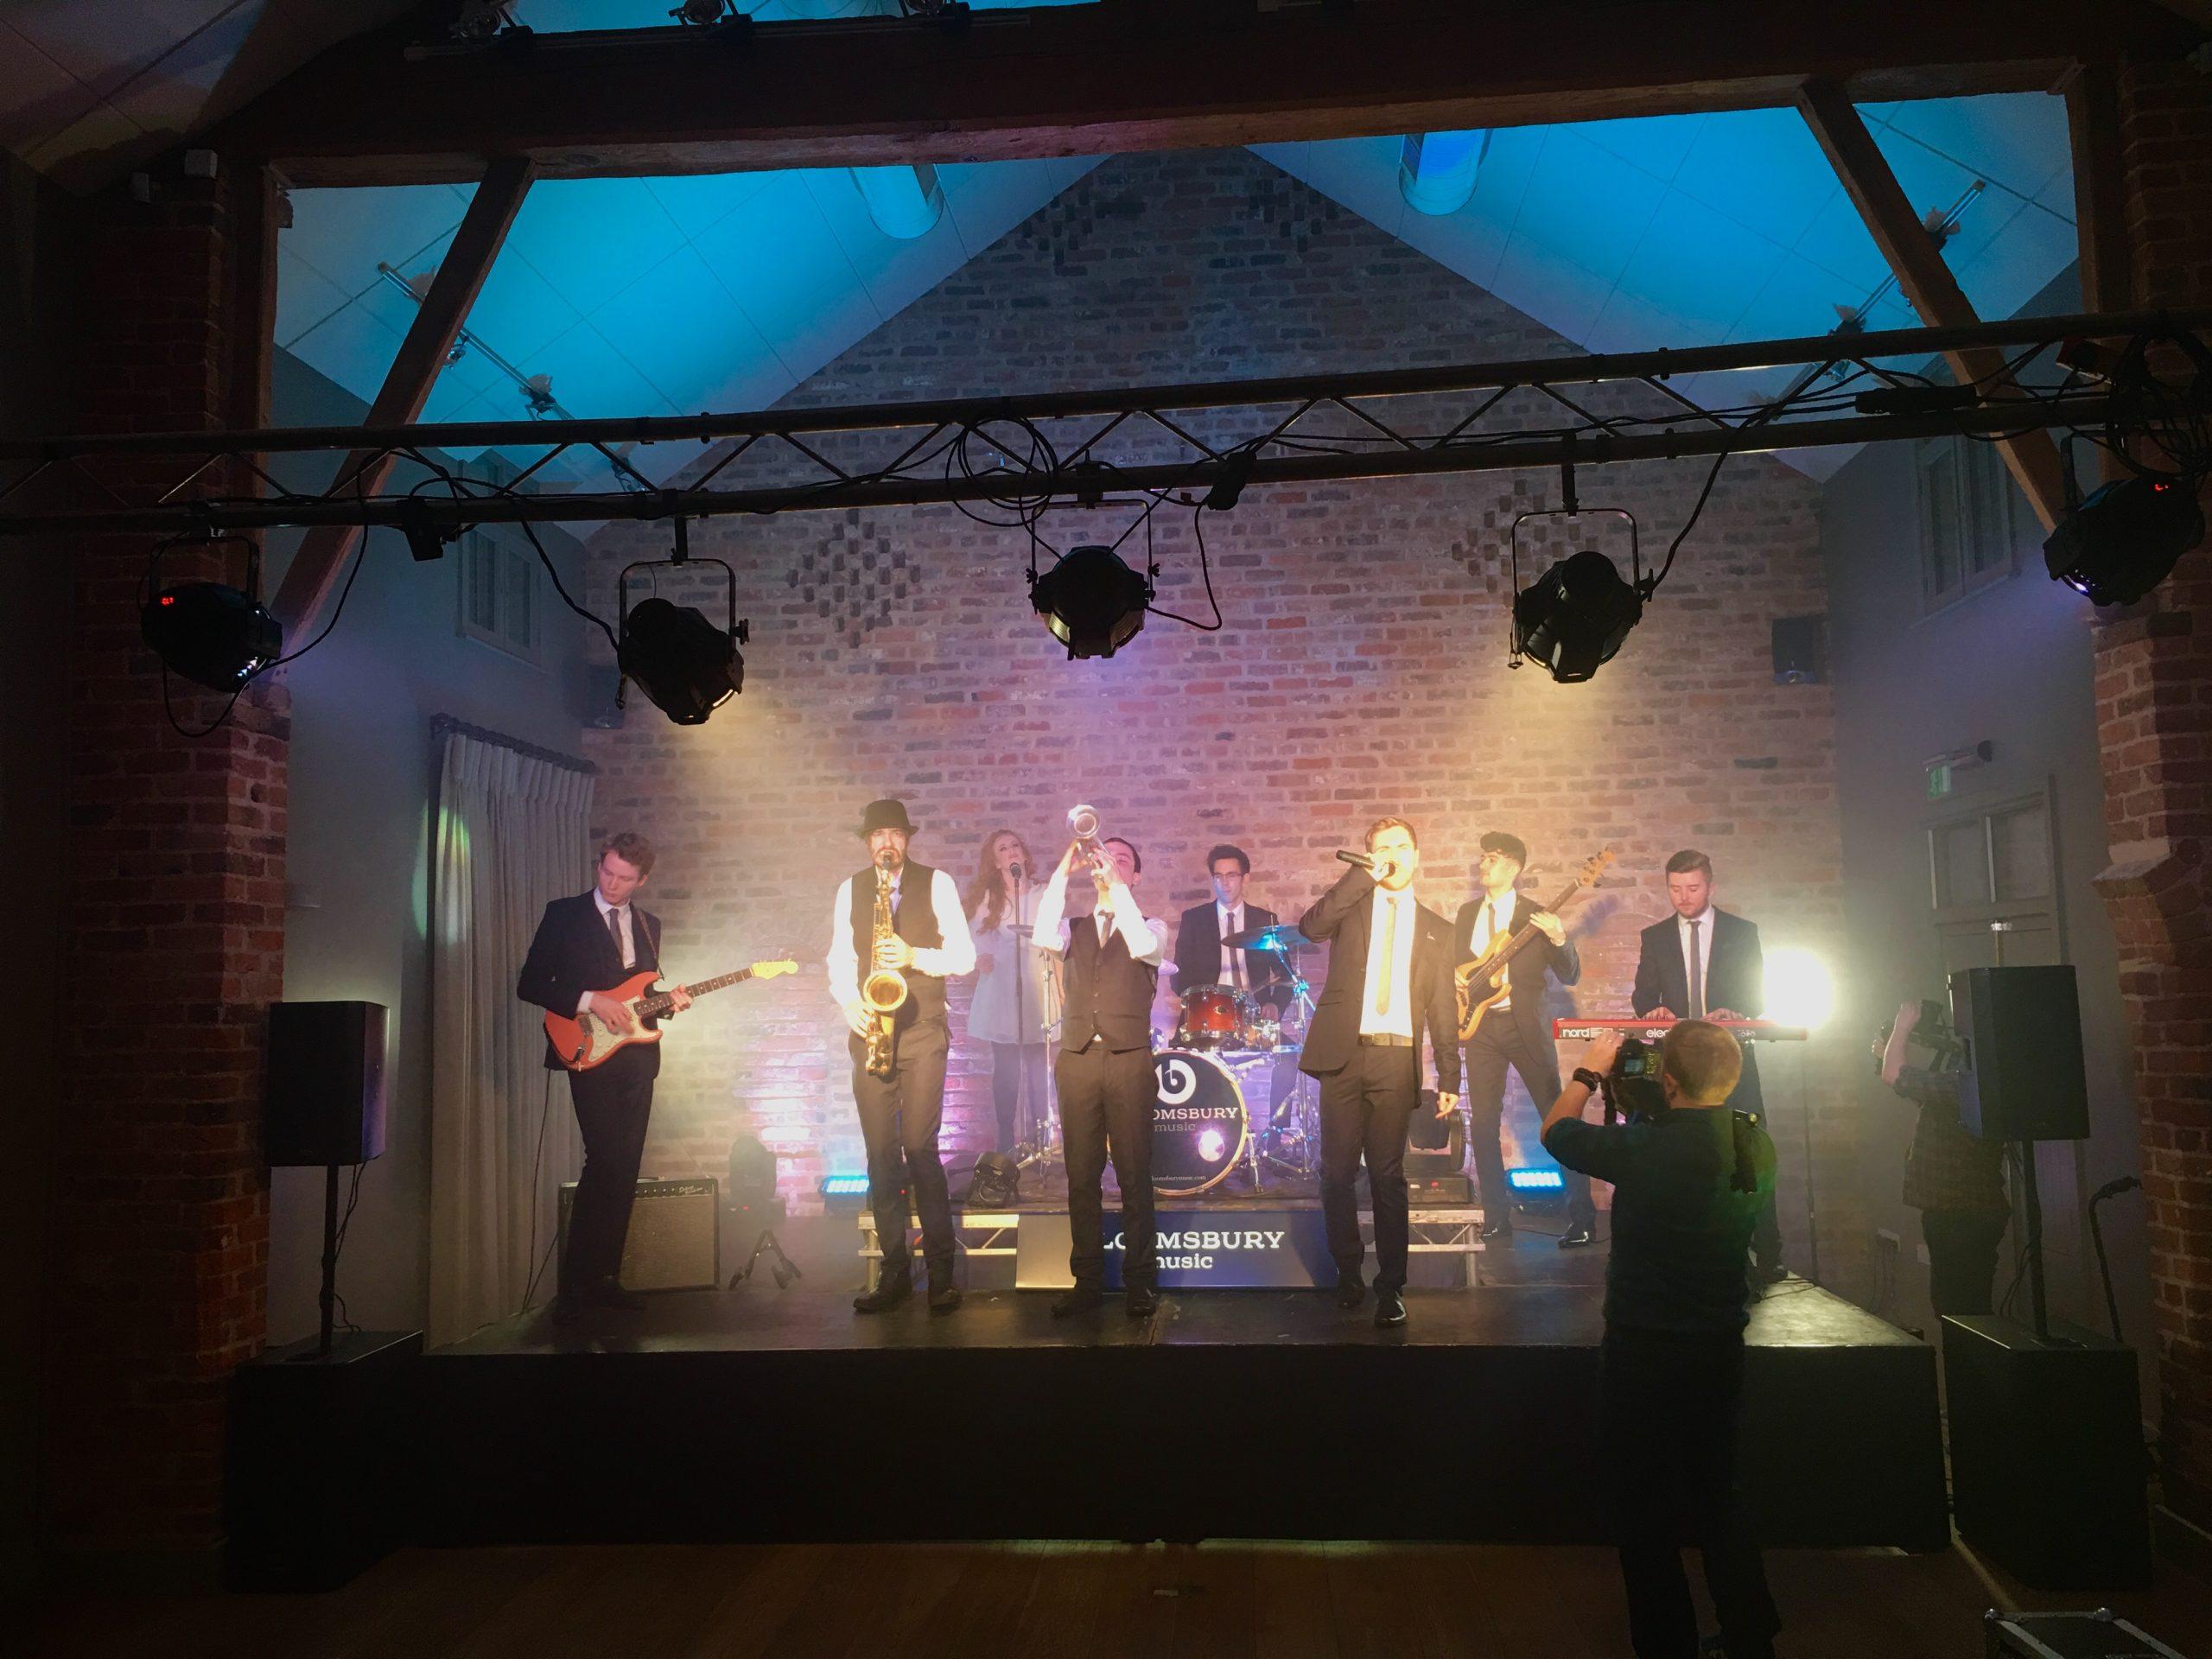 Arley Hall Wedding Venue – Cheshire Wedding Band & Wedding Entertainment Preferred Suppliers